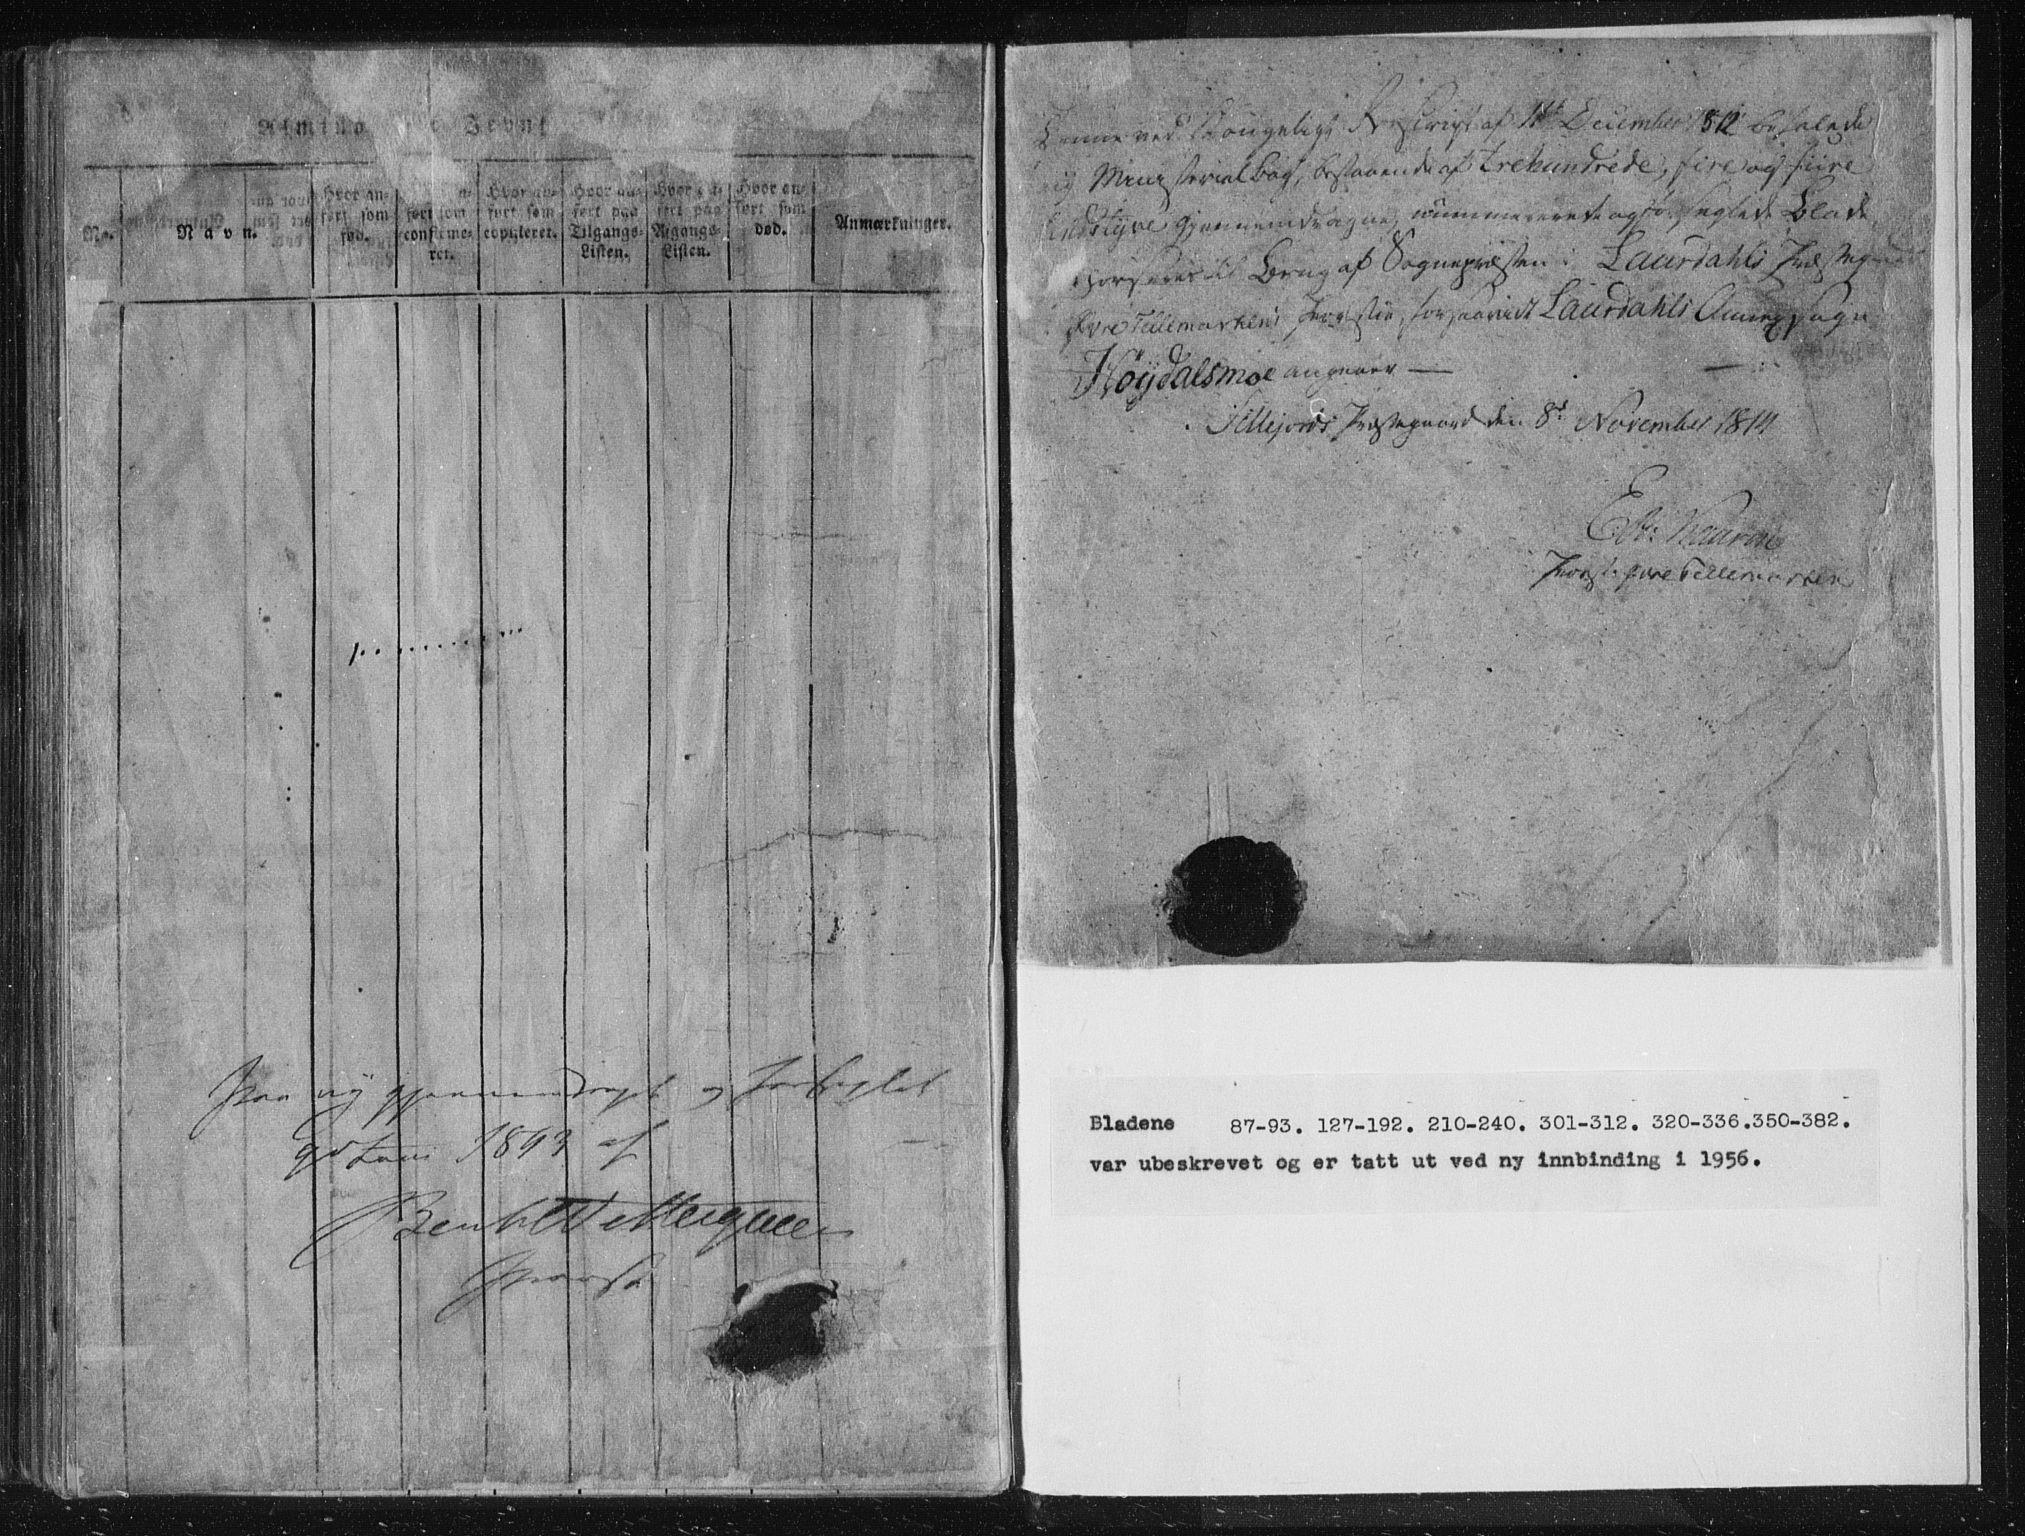 SAKO, Lårdal kirkebøker, F/Fc/L0001: Ministerialbok nr. III 1, 1815-1860